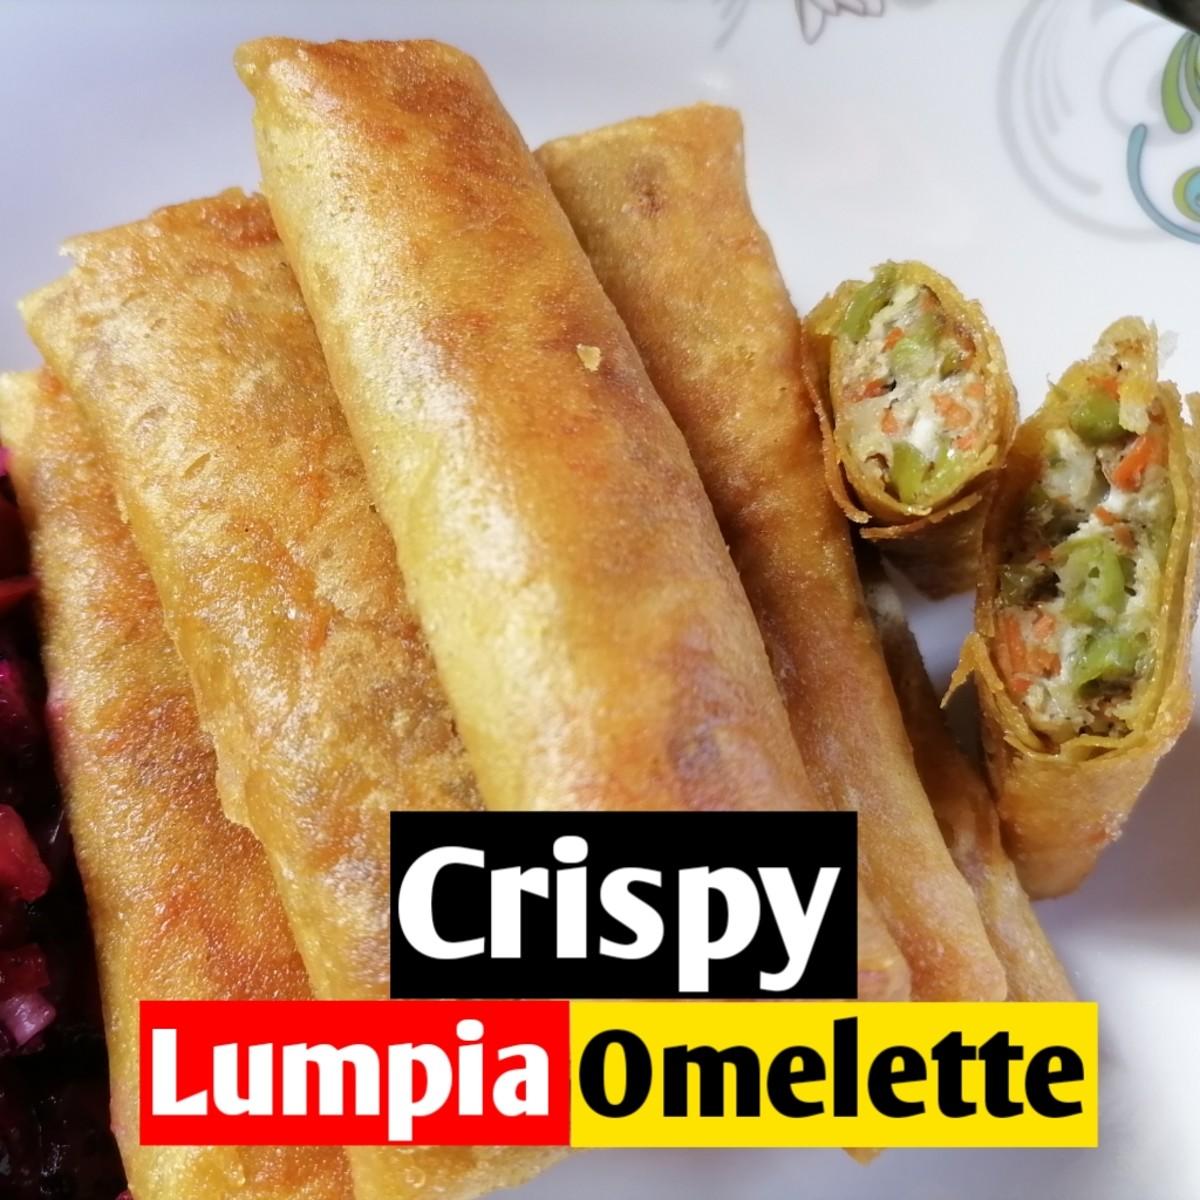 Crispy lumpia omelette